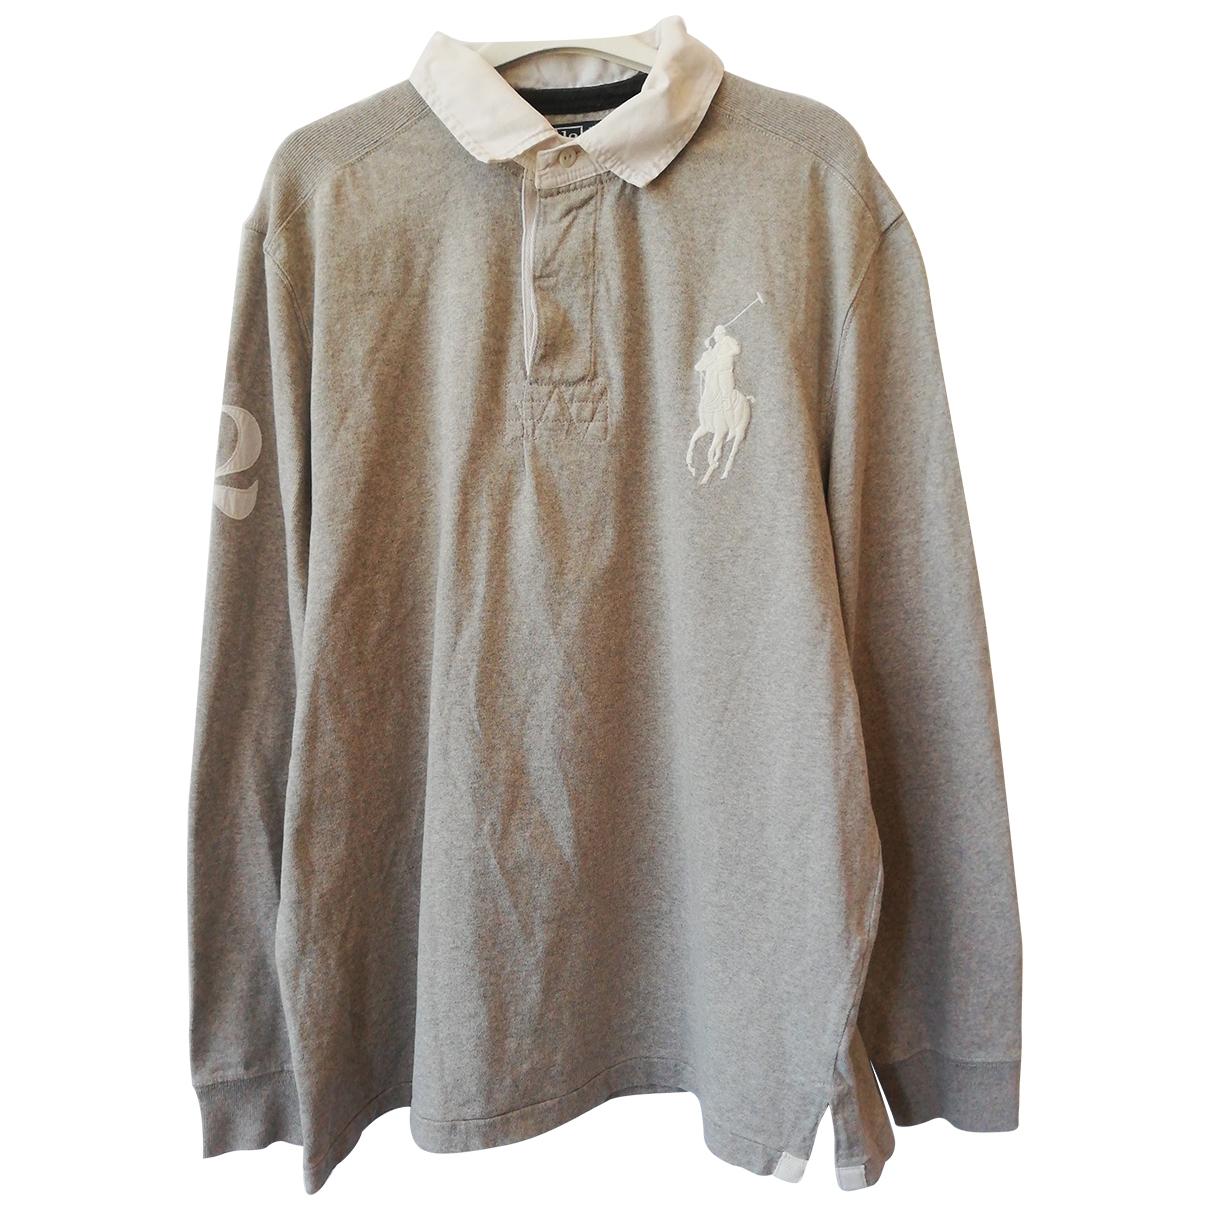 Polo Ralph Lauren Polo classique manches longues Grey Cotton Polo shirts for Men L International